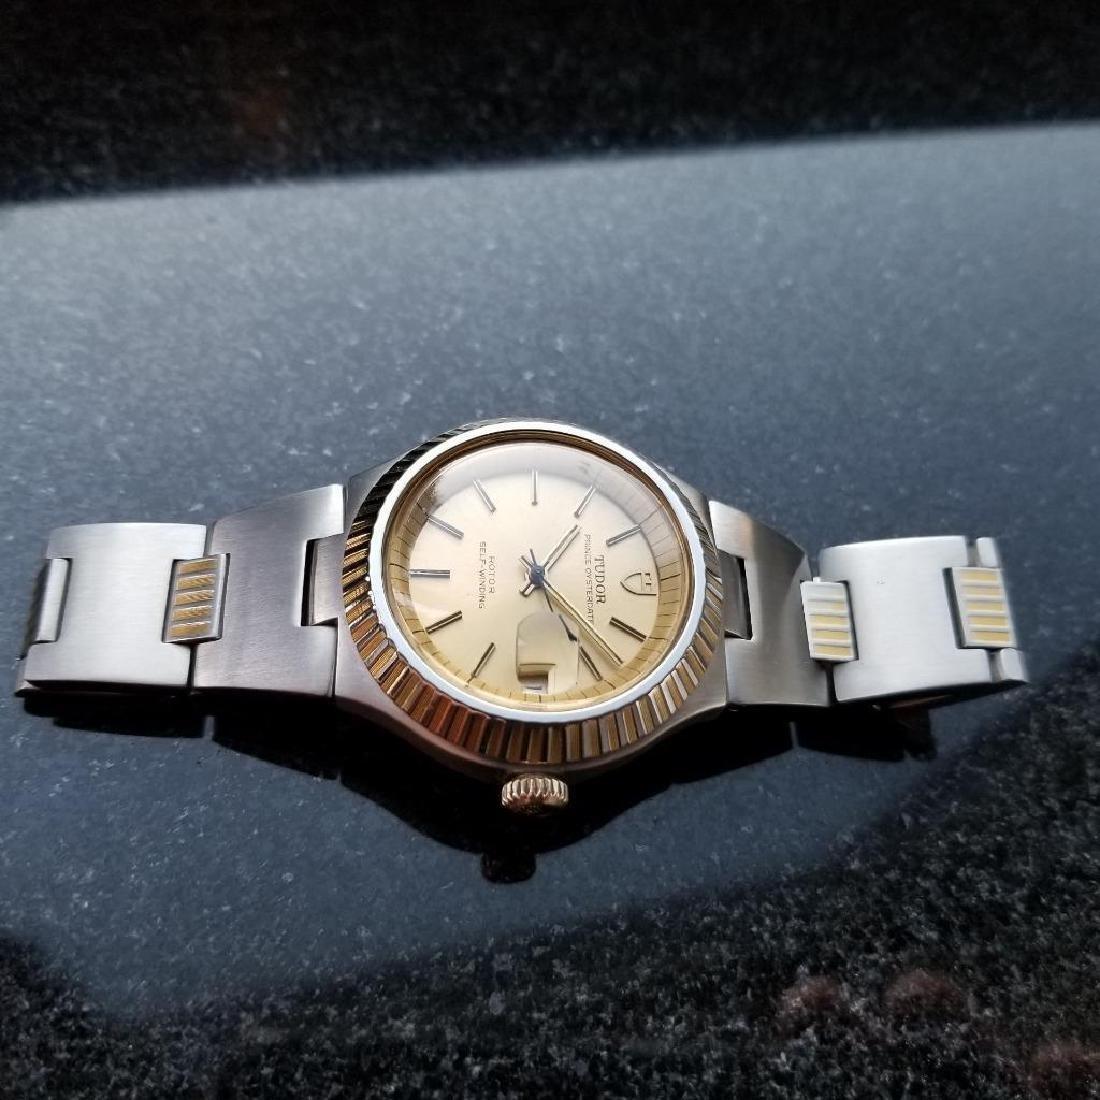 Rolex Vintage Tudor Prince Oysterdate 1975 Automatic - 6